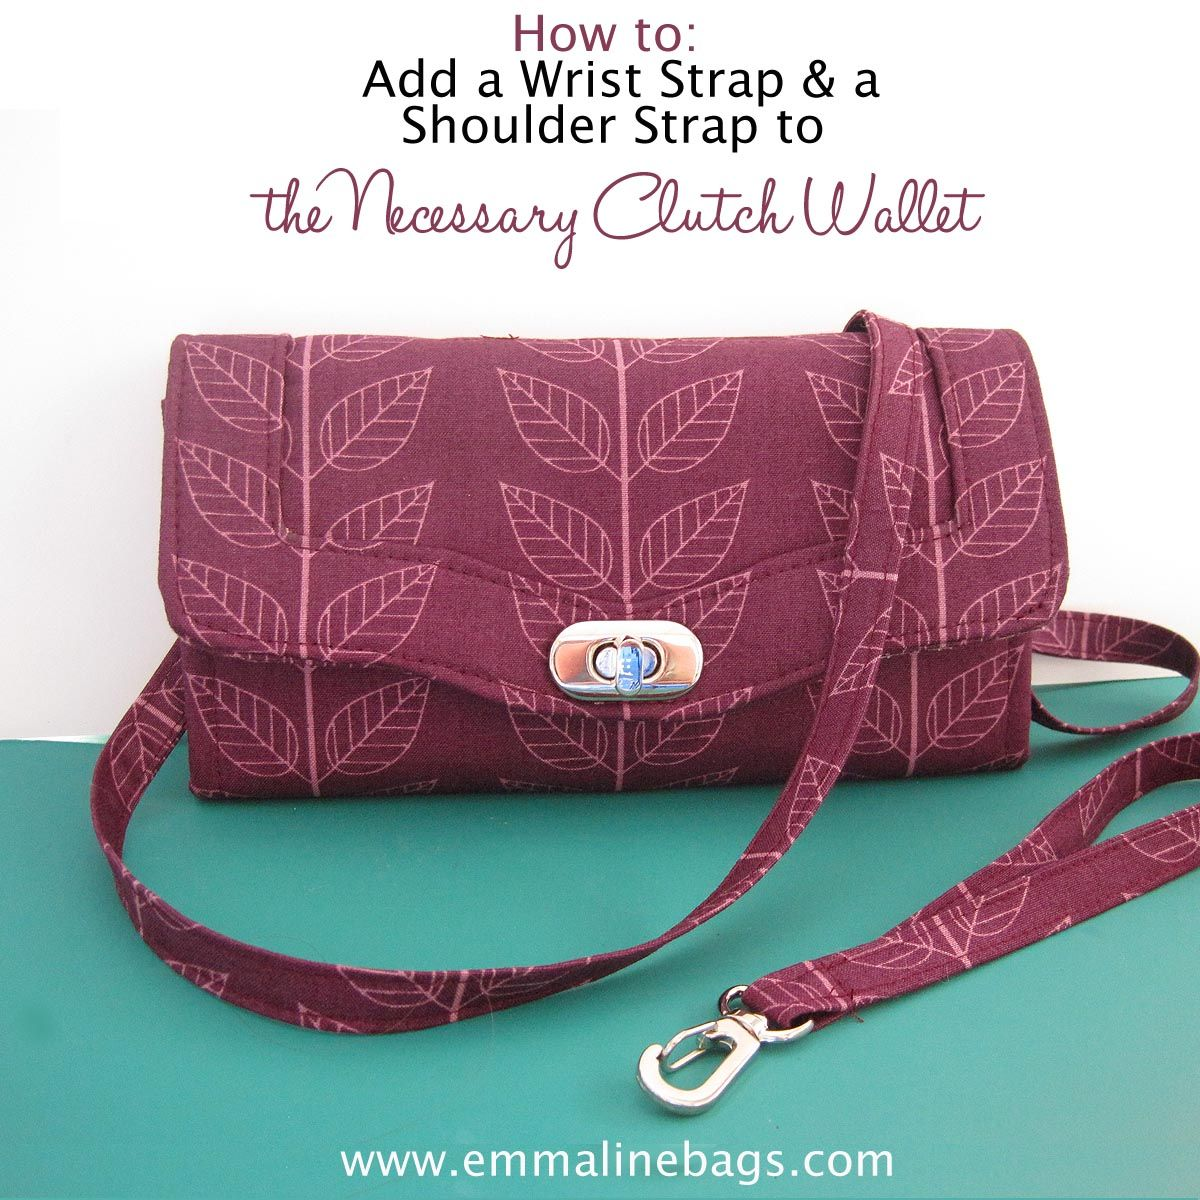 cf20ada830e1 michael kors clutch with wrist strap necessary